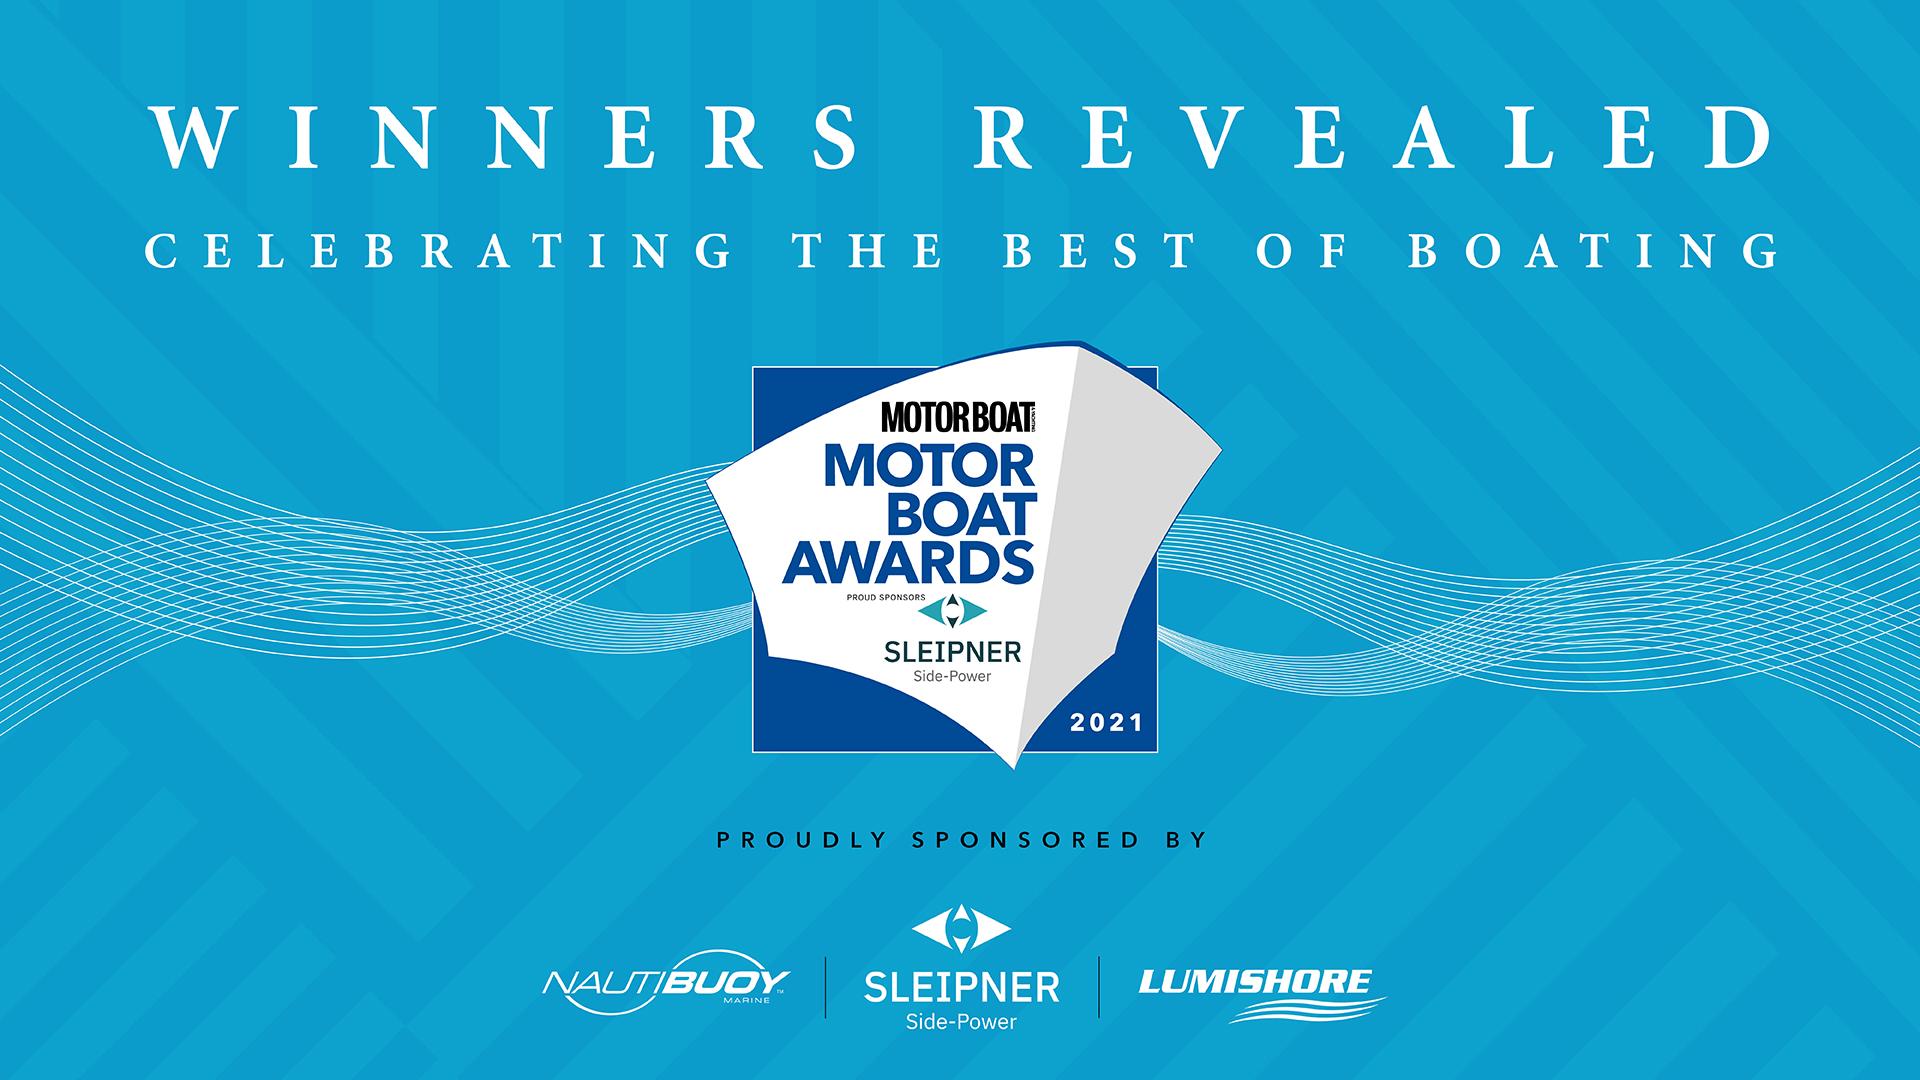 Winners of the 2021 Motor Boat Awards revealed